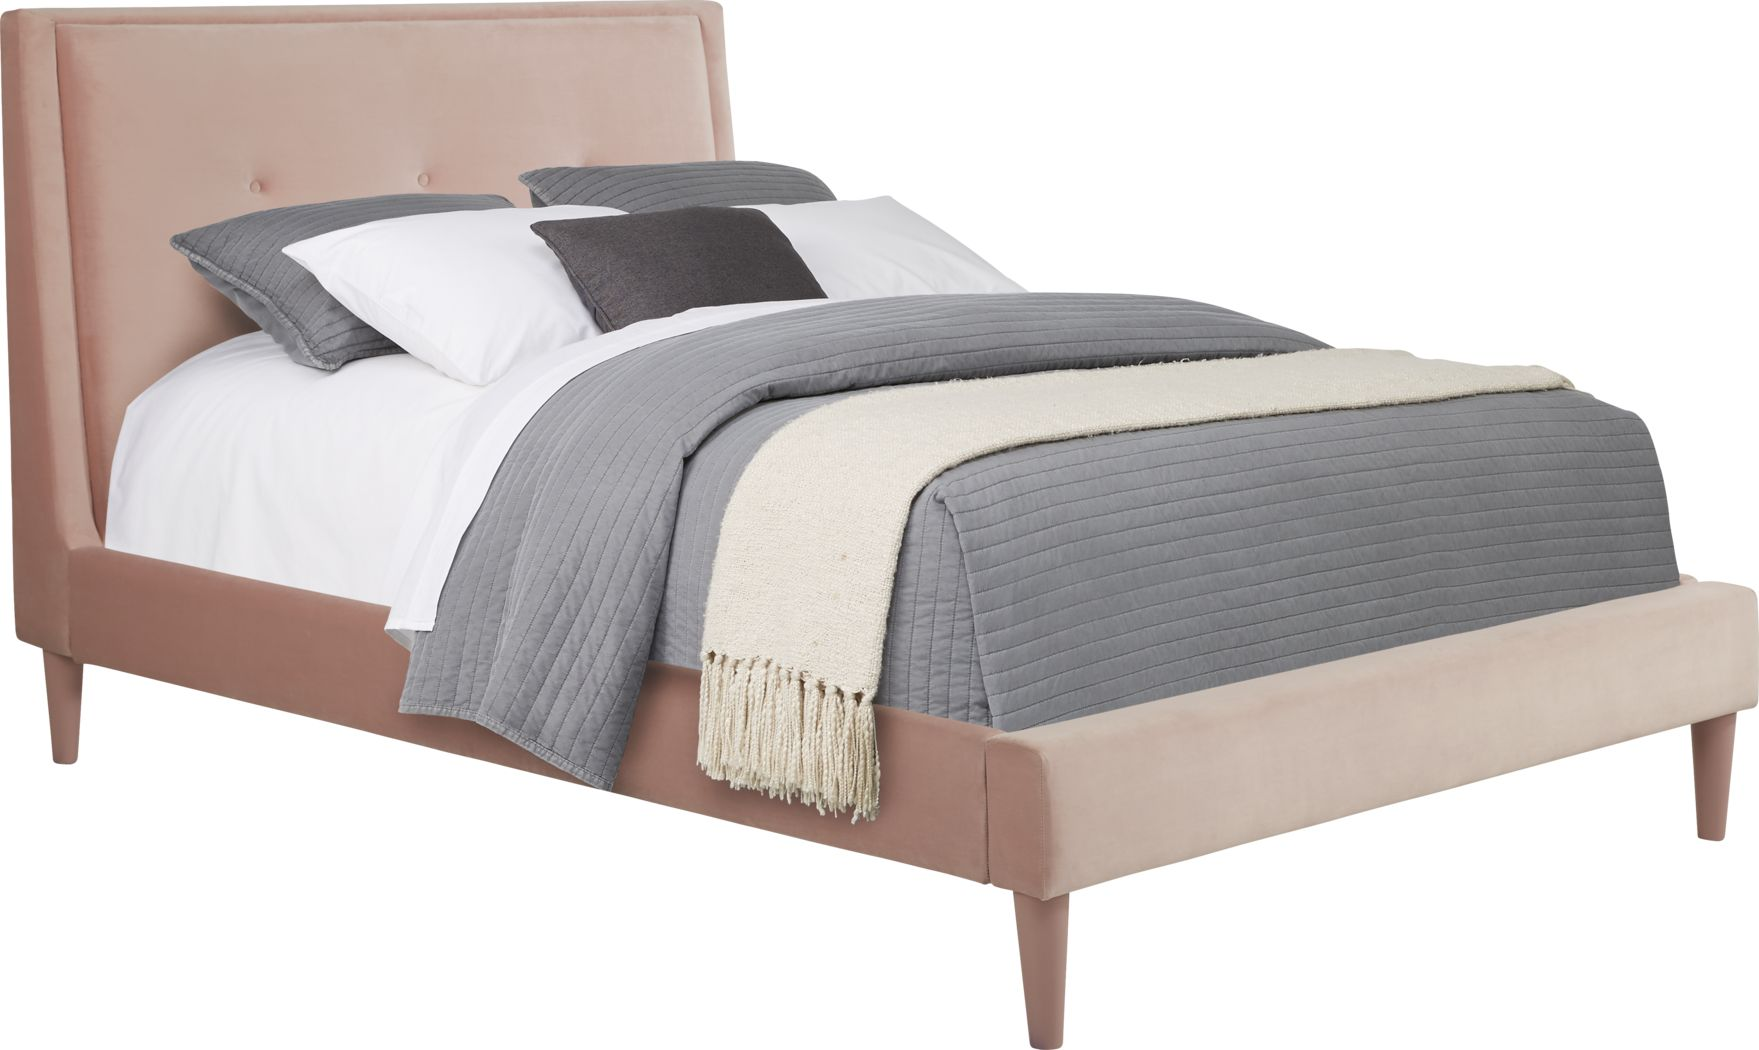 Kids Jaidyn Pink 3 Pc Full Upholstered Bed